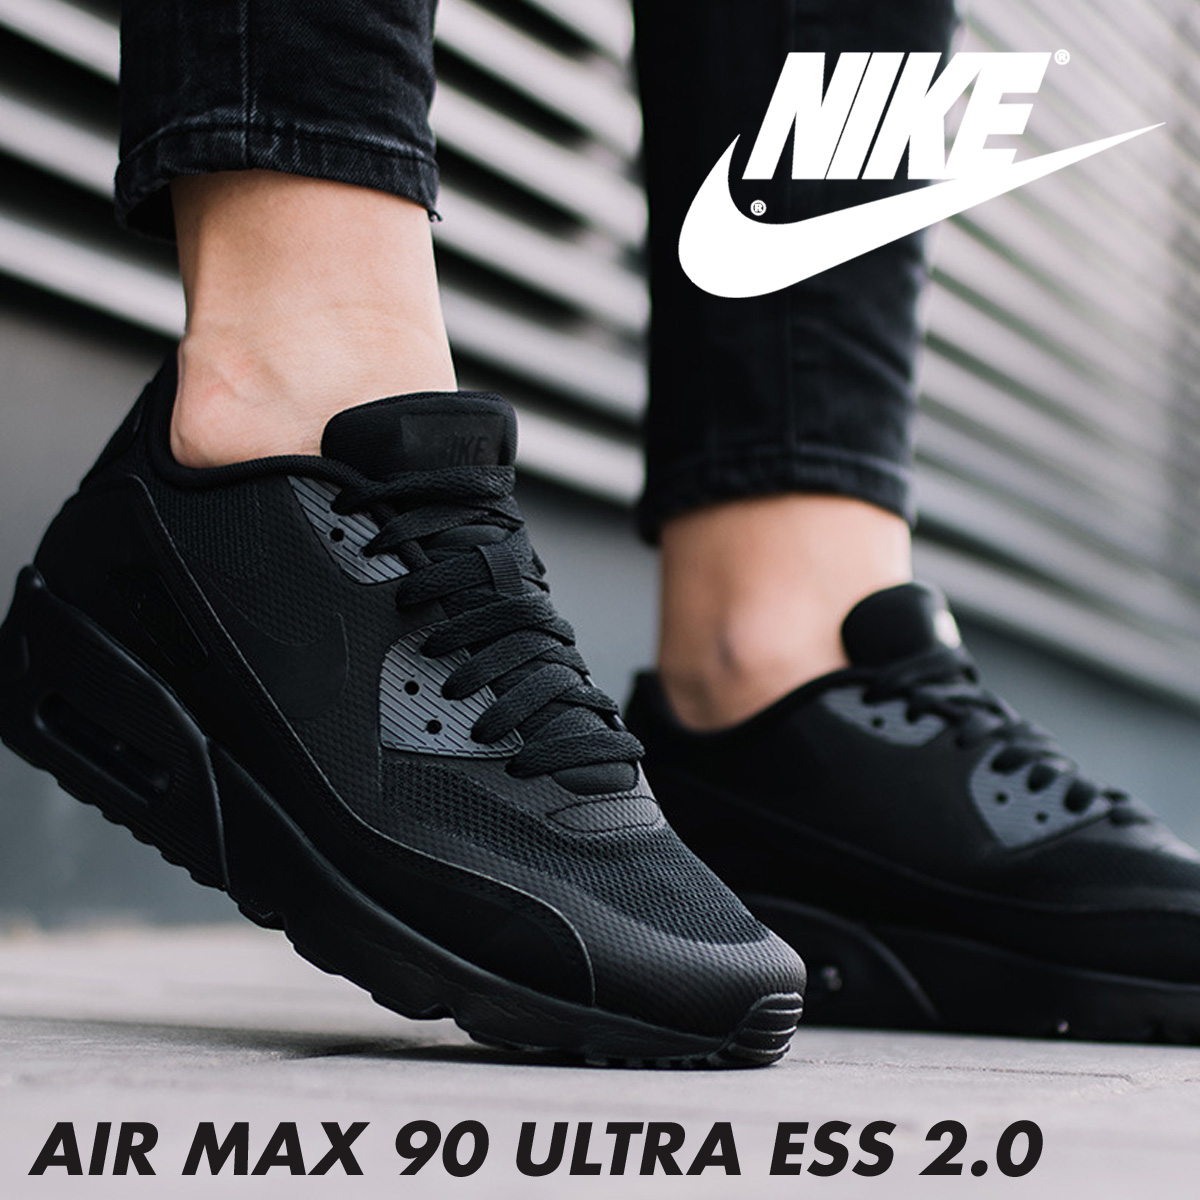 NIKE ナイキ エアマックス90 レディース スニーカー AIR MAX 90 ULTRA ESS 2 0 GS 869950 001 ブラック 黒vmnPyN80wO